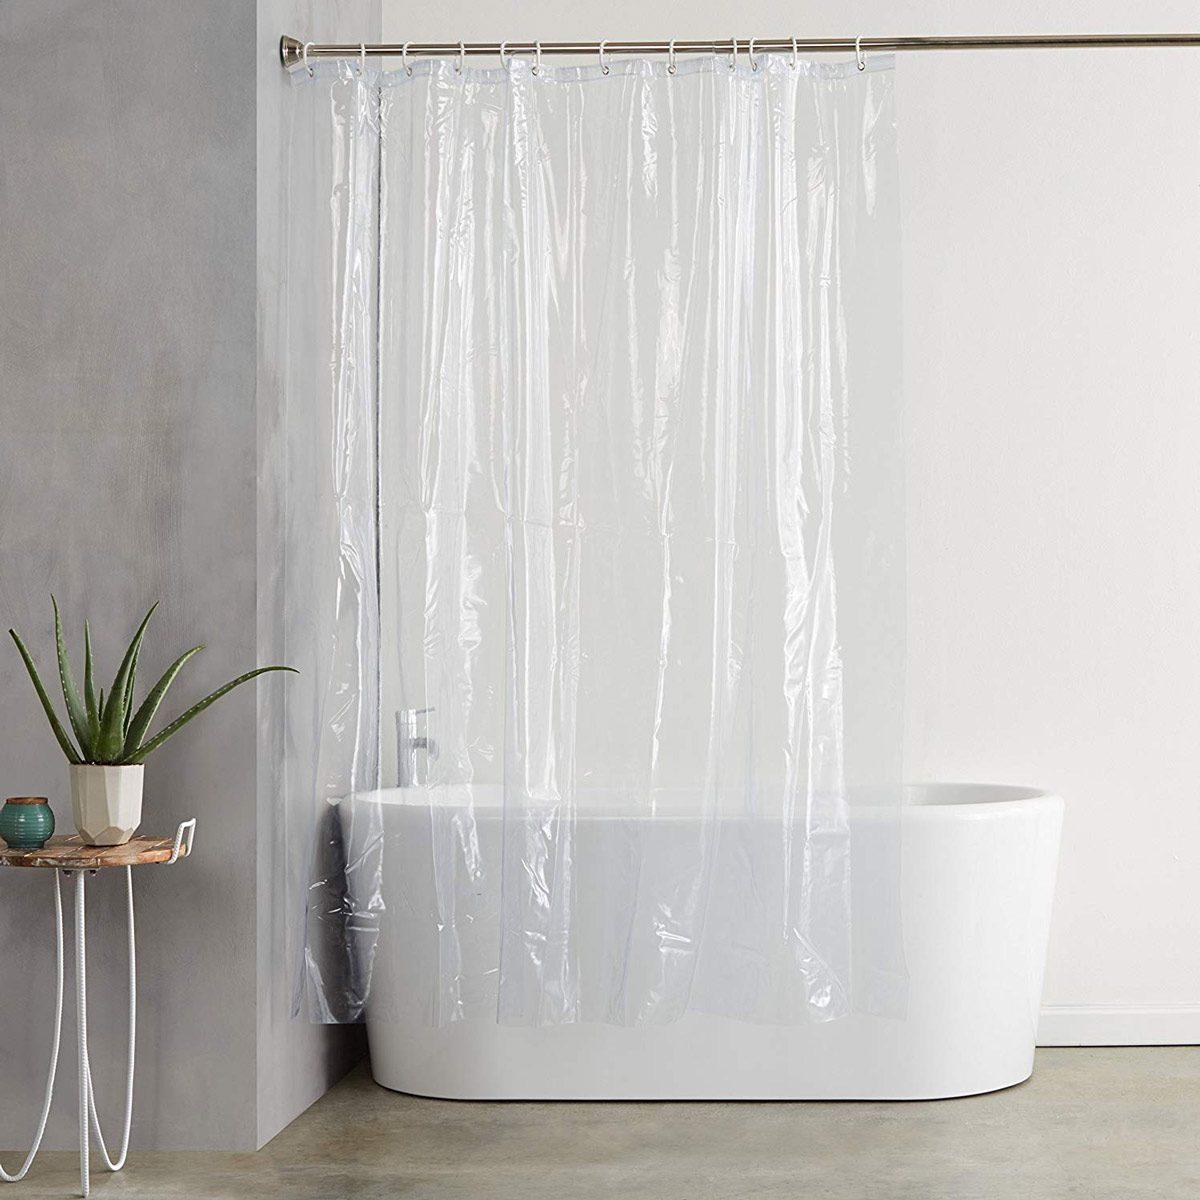 Plastic-Shower-Curtain-Liner